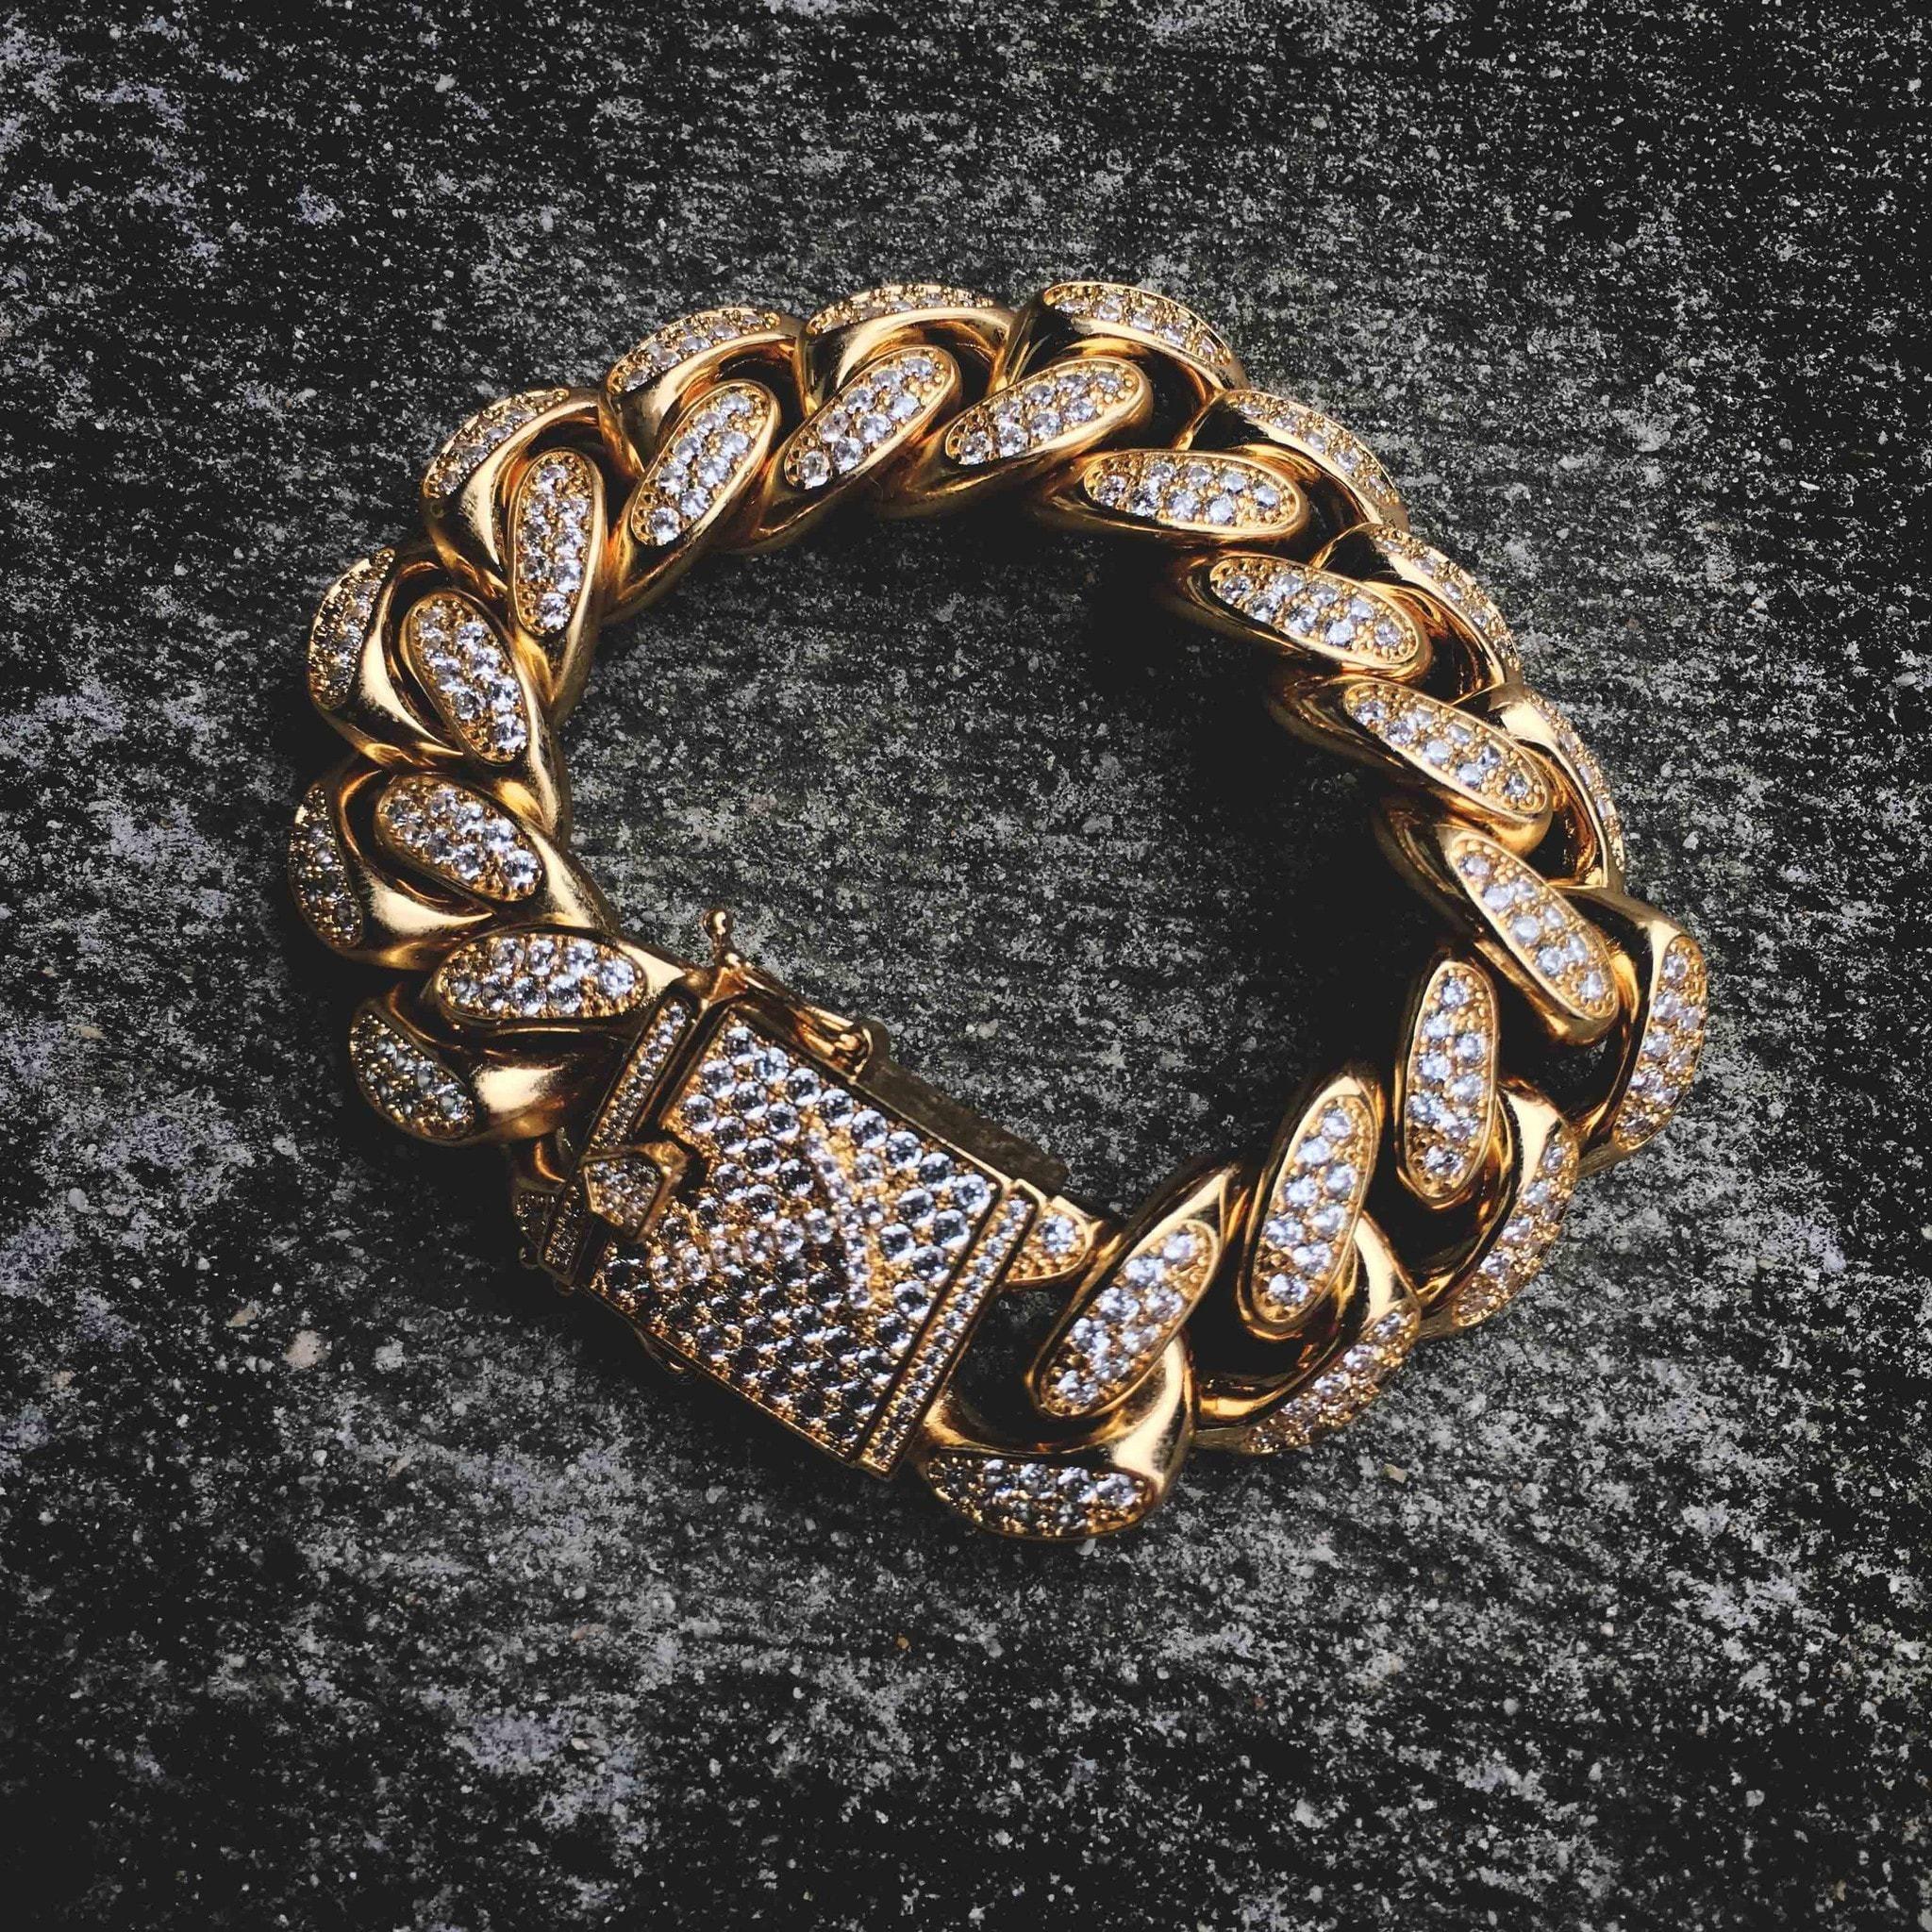 3c938ab26fe69 Diamond Cuban Link Bracelet (19mm) in Yellow Gold | HIPHOP CULTURE ...